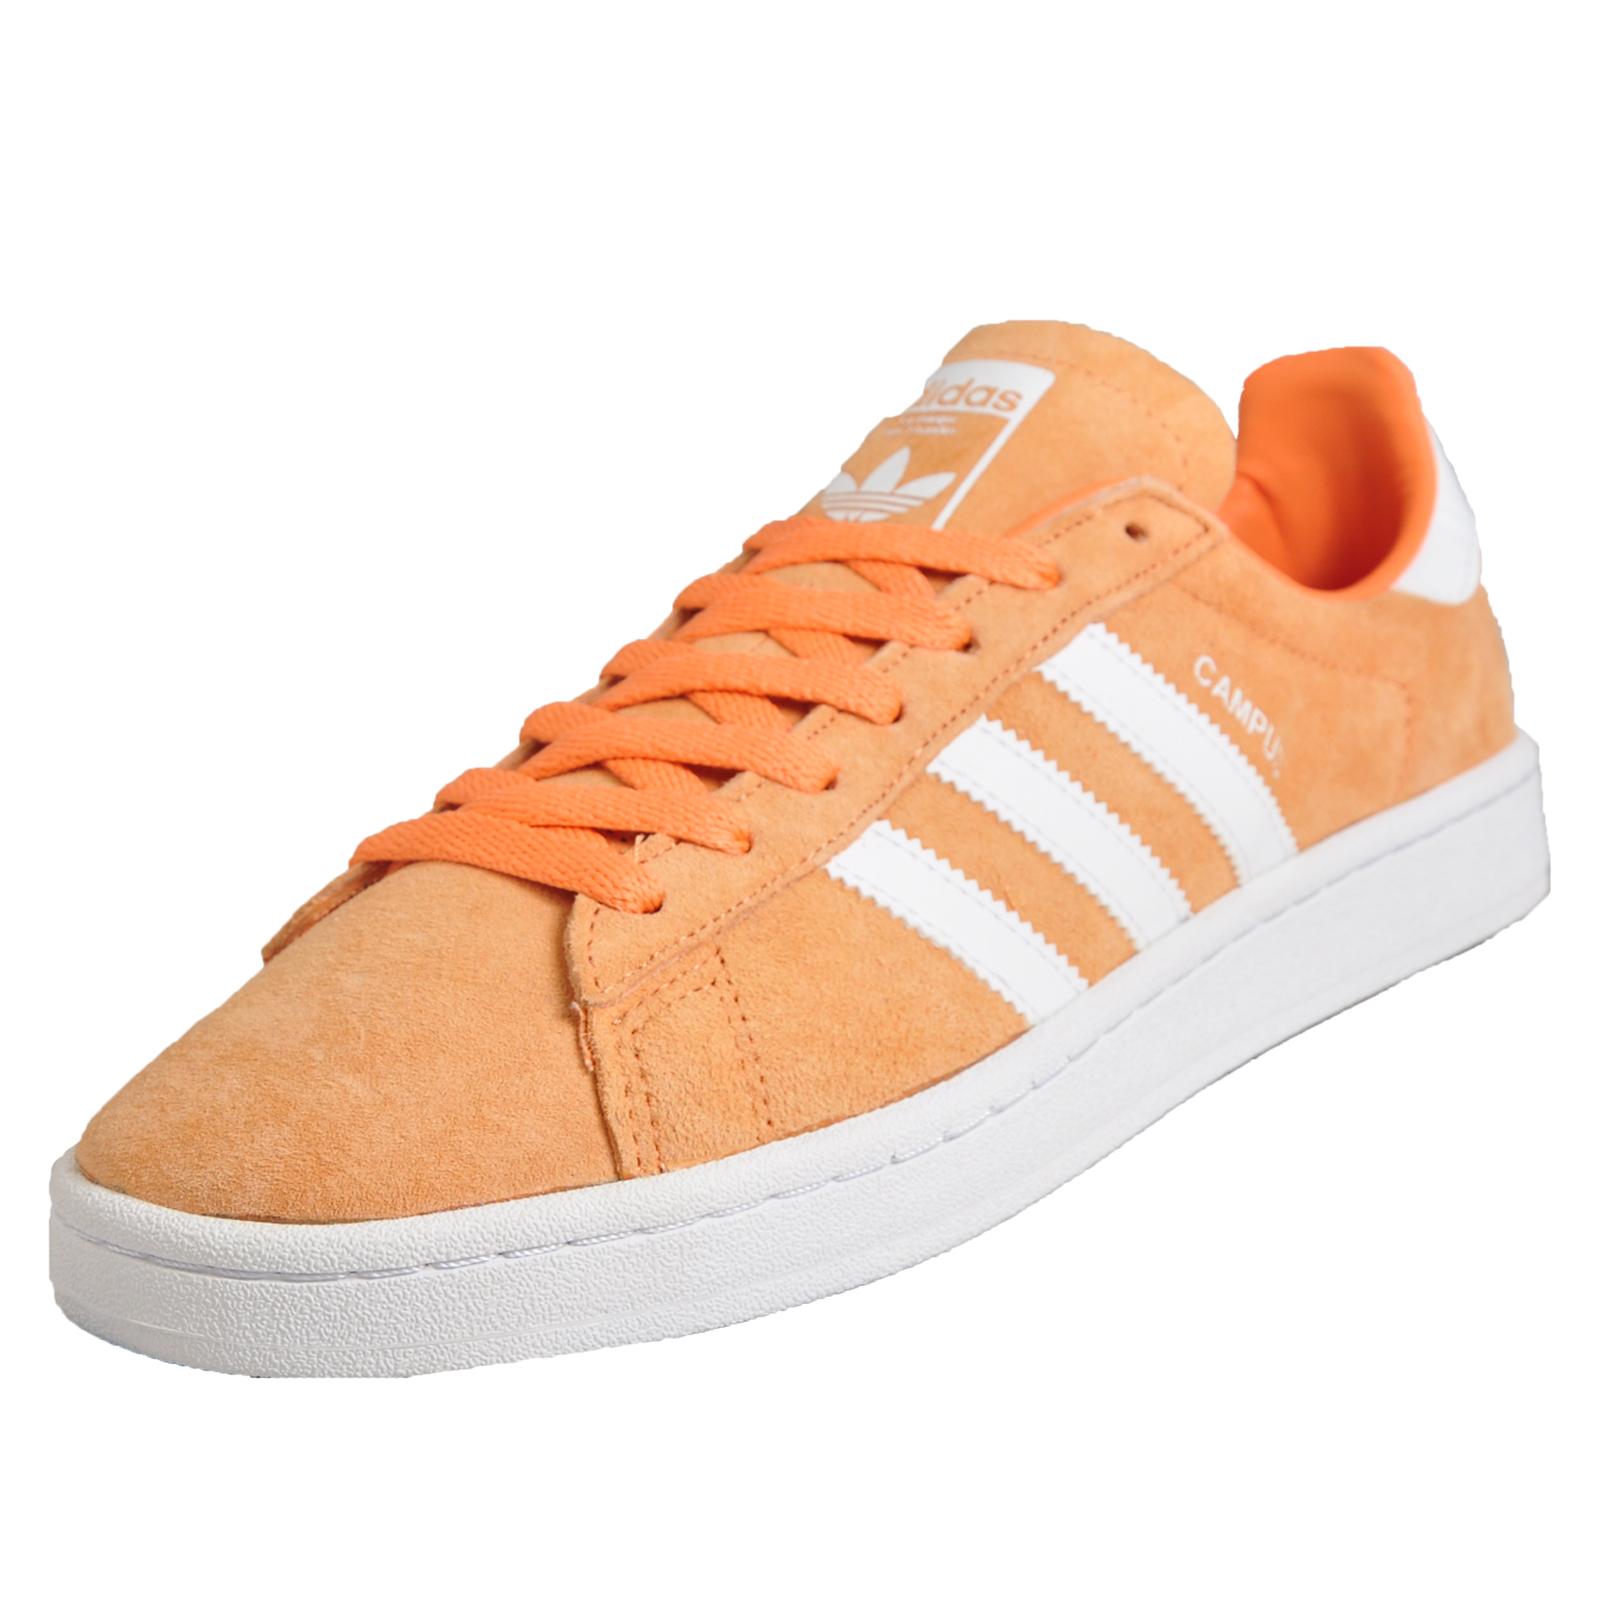 e6a4d6246bb1 Details about Adidas Originals Campus Mens Suede Leather Vintage Retro  Sneakers Trainers